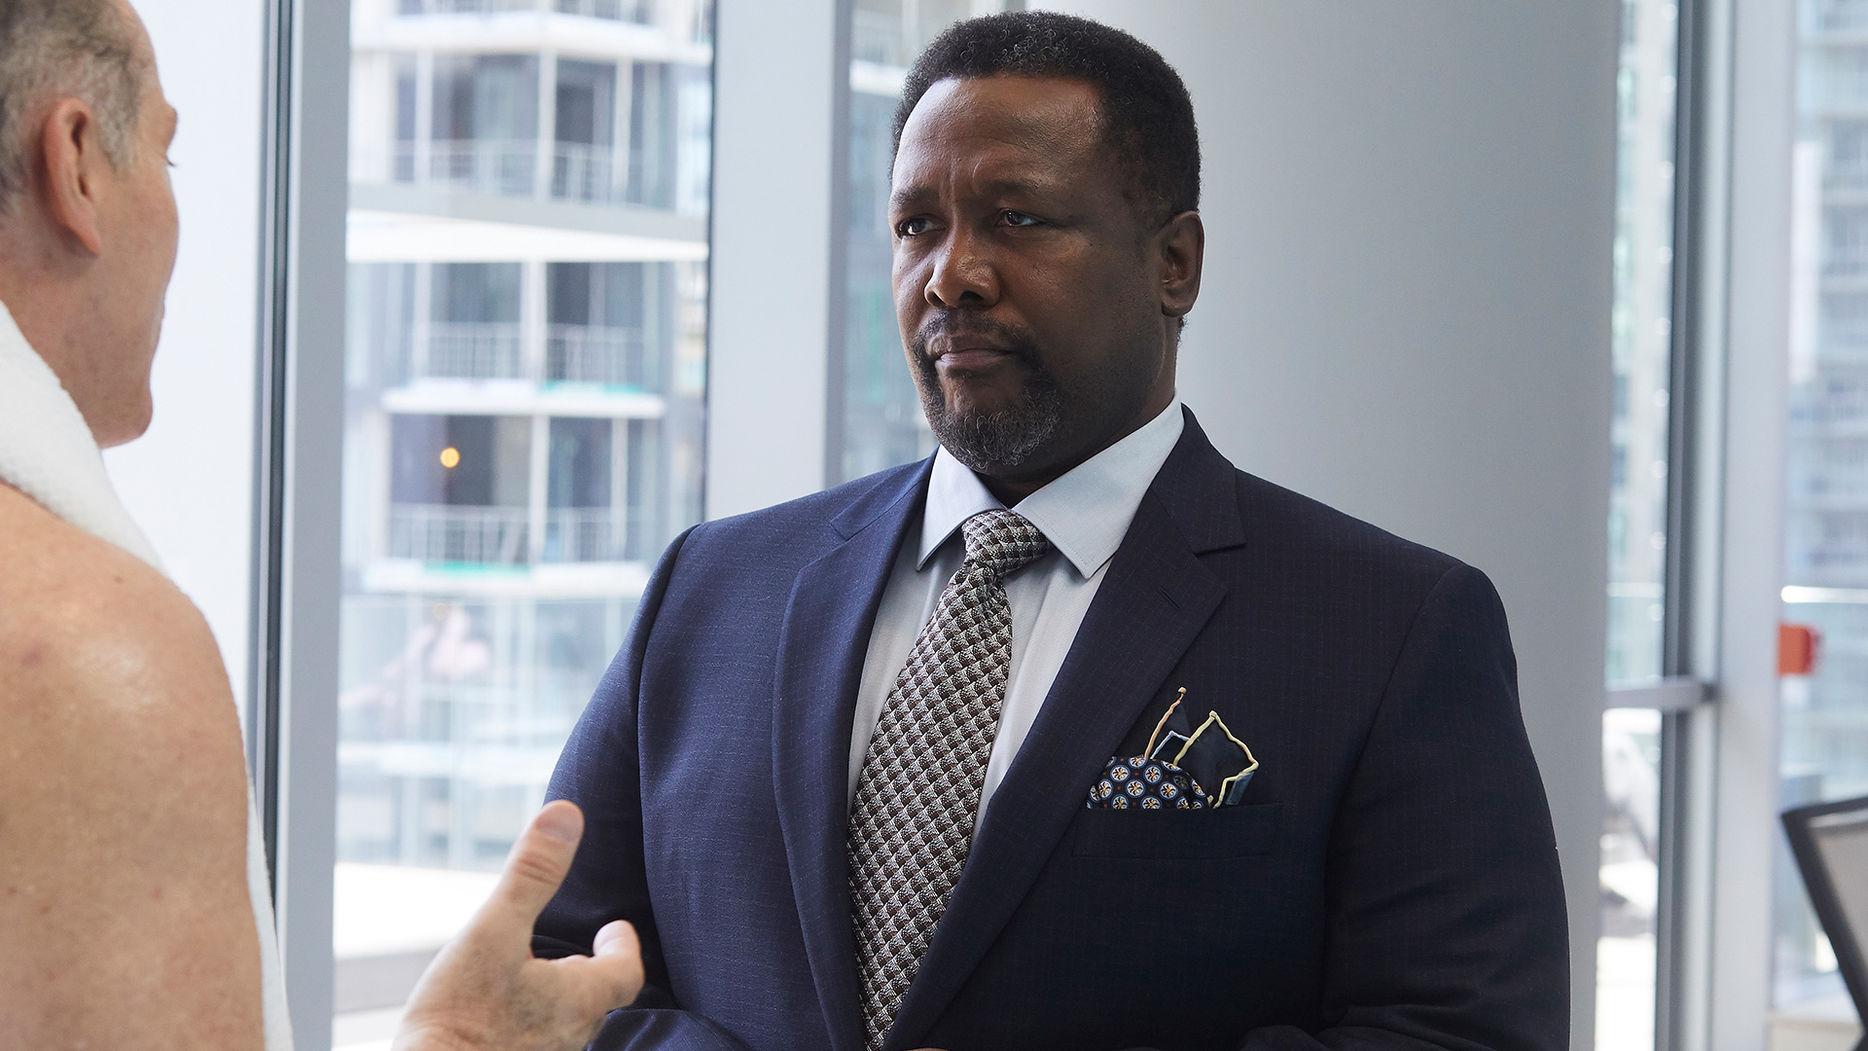 Suits Season 8 Episode 9 Review: Motion To Delay – Appocalypse